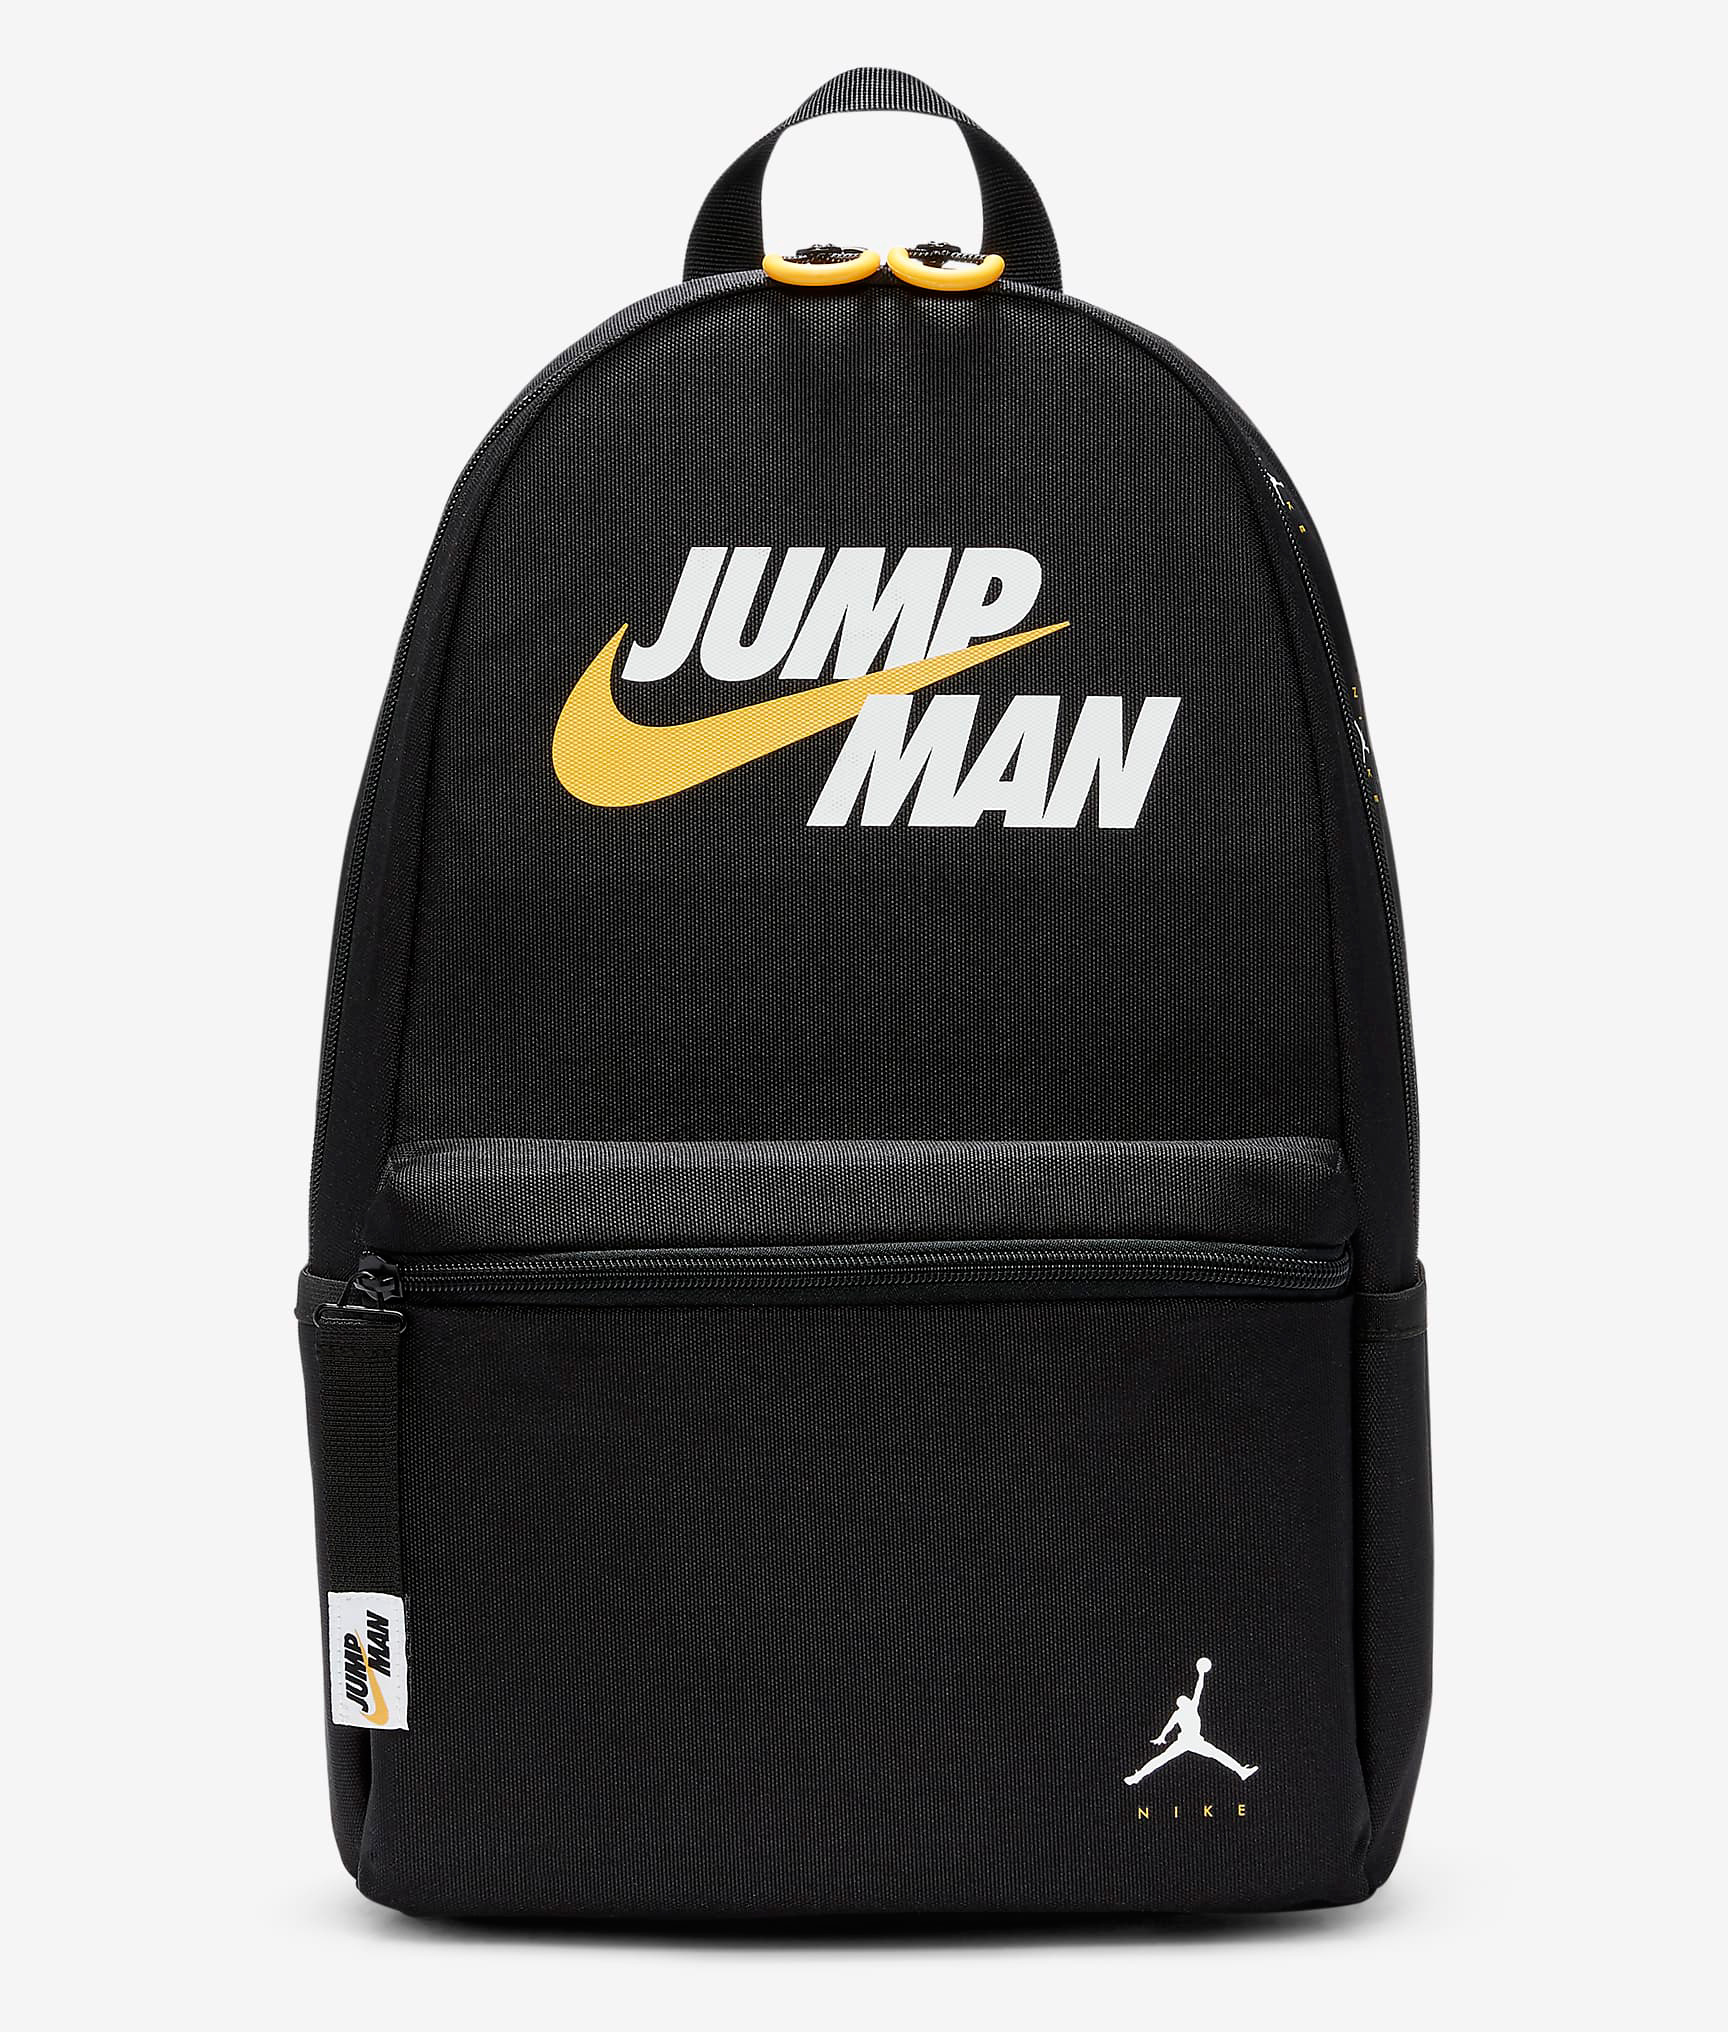 jordan-jumpman-backpack-black-white-yellow